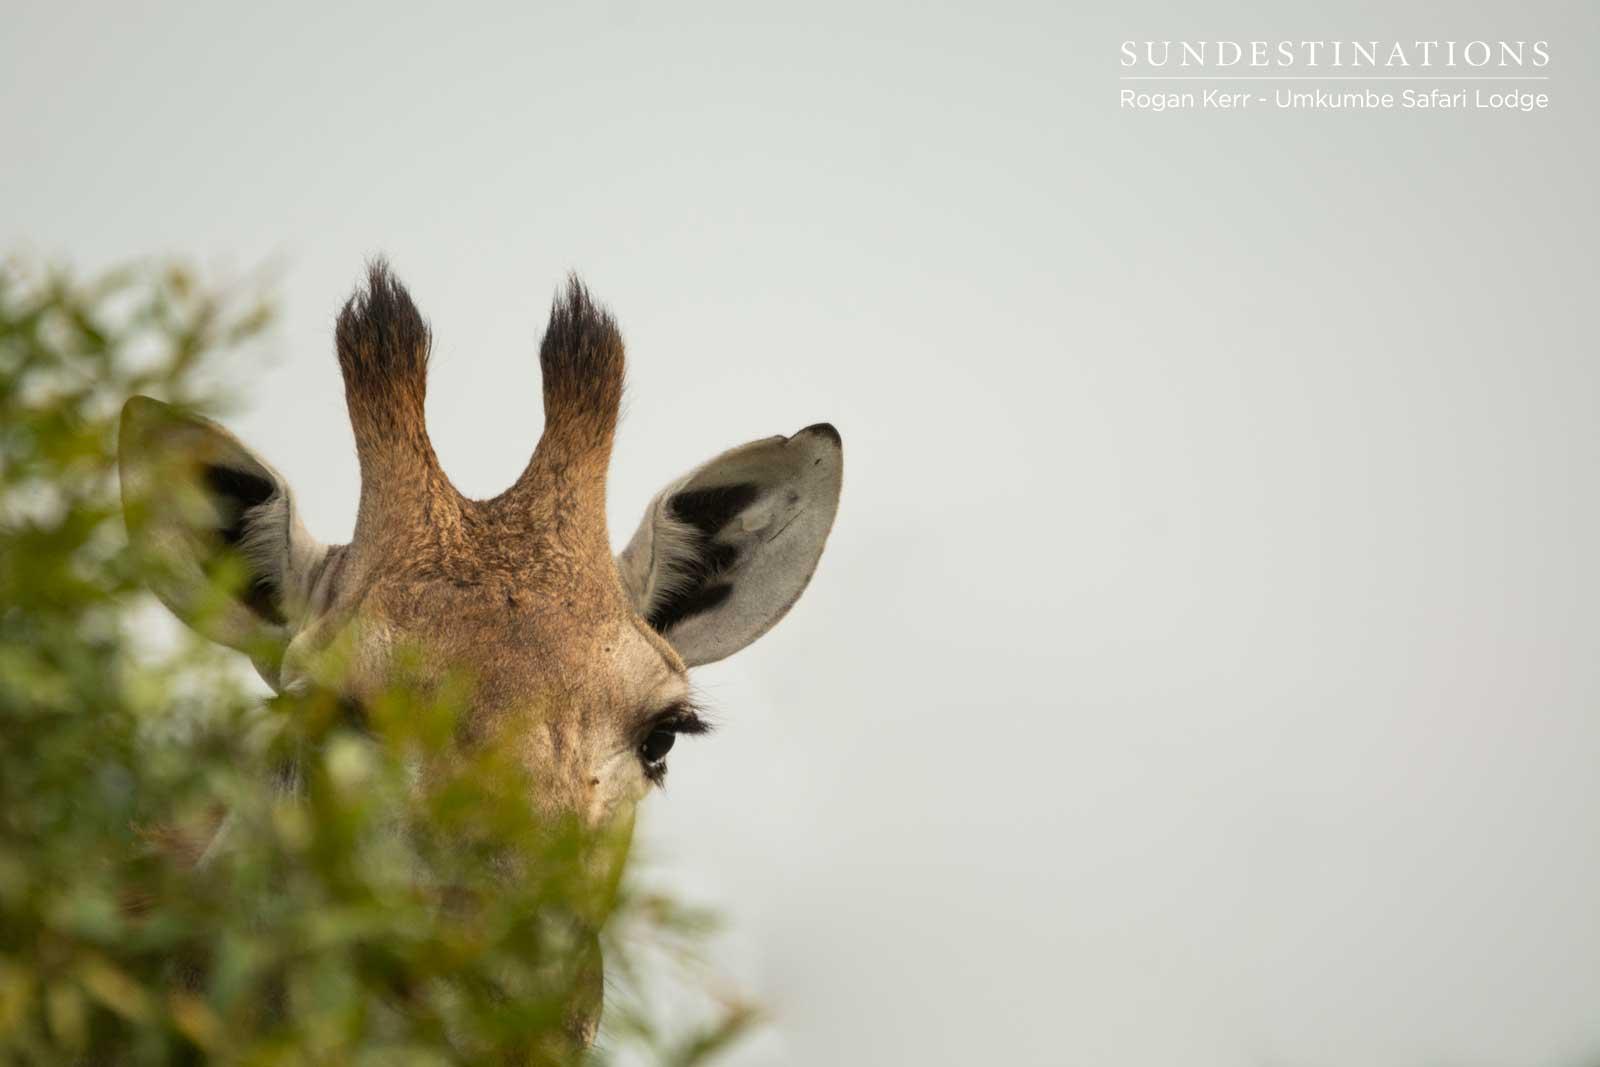 Giraffe at Umkumbe